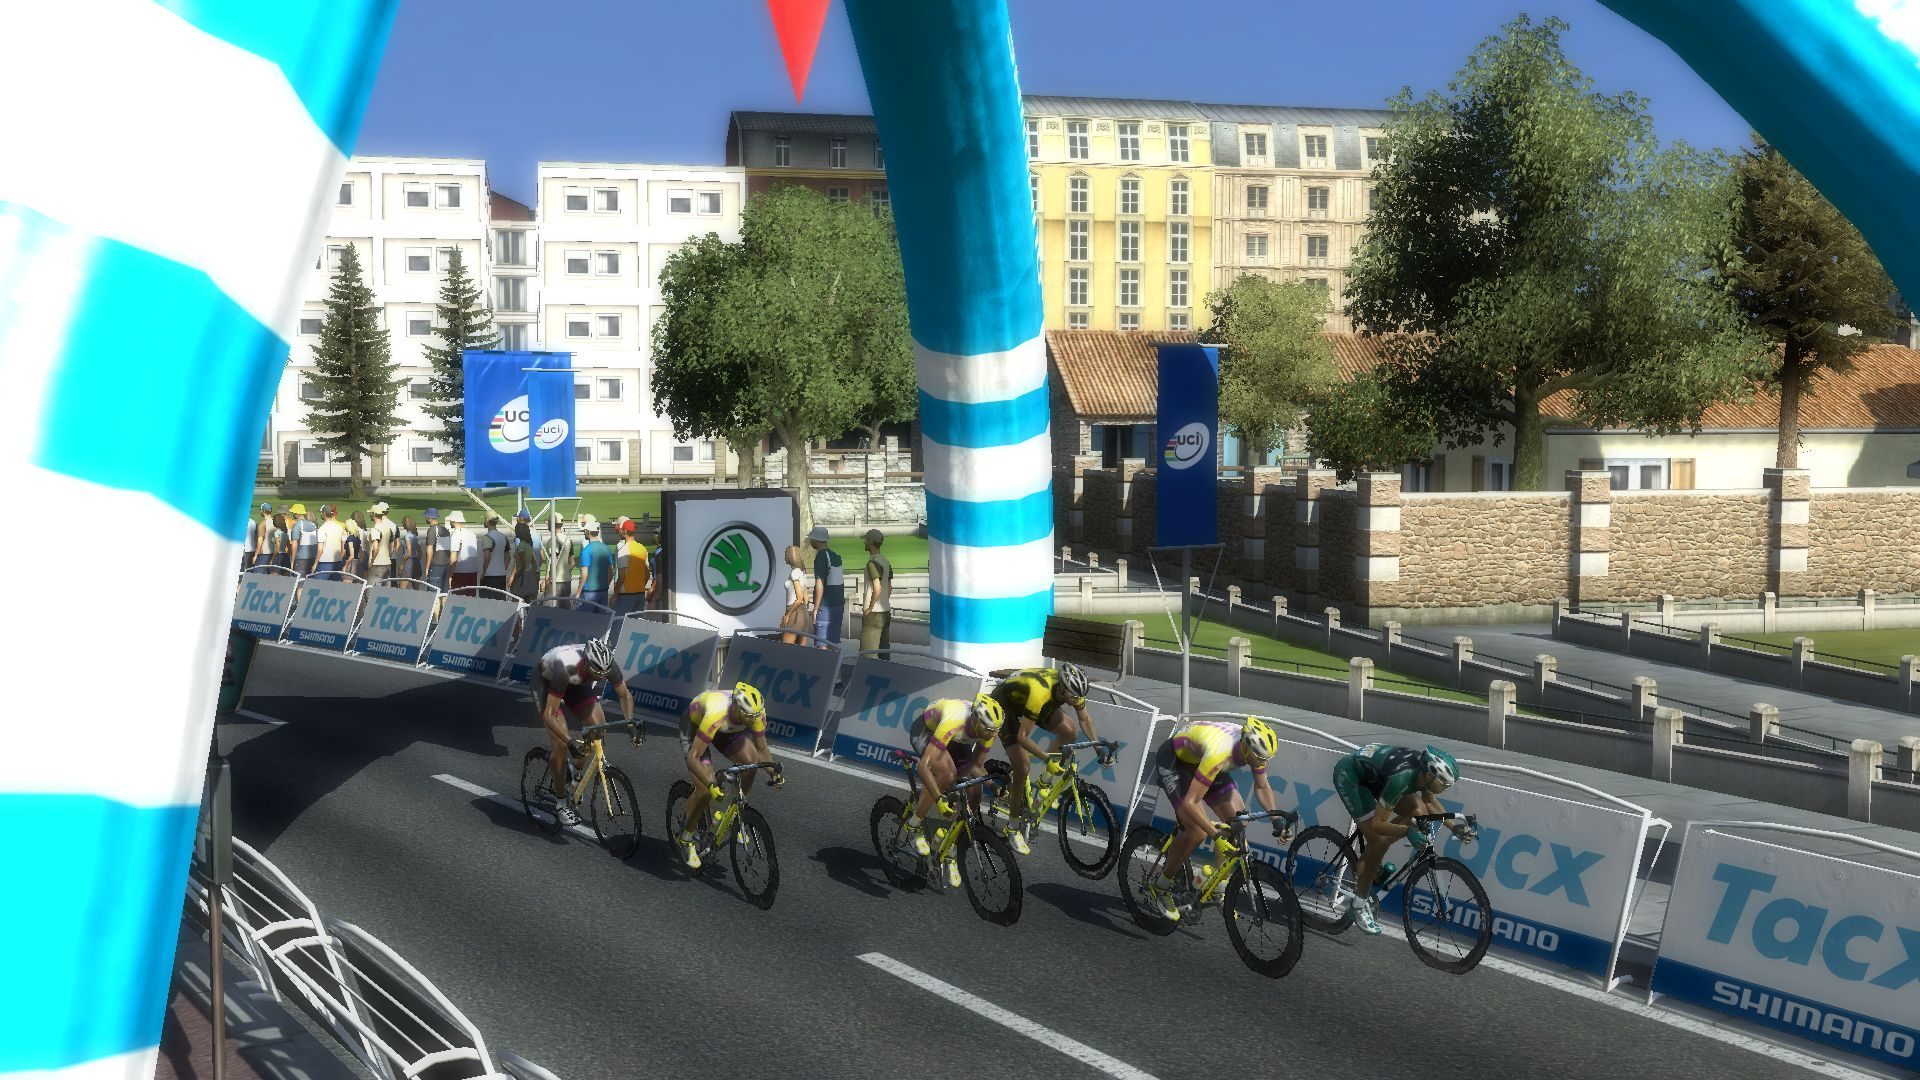 pcmdaily.com/images/mg/2017/Races/PTHC/LisbonClassic/Lisbon17.jpg